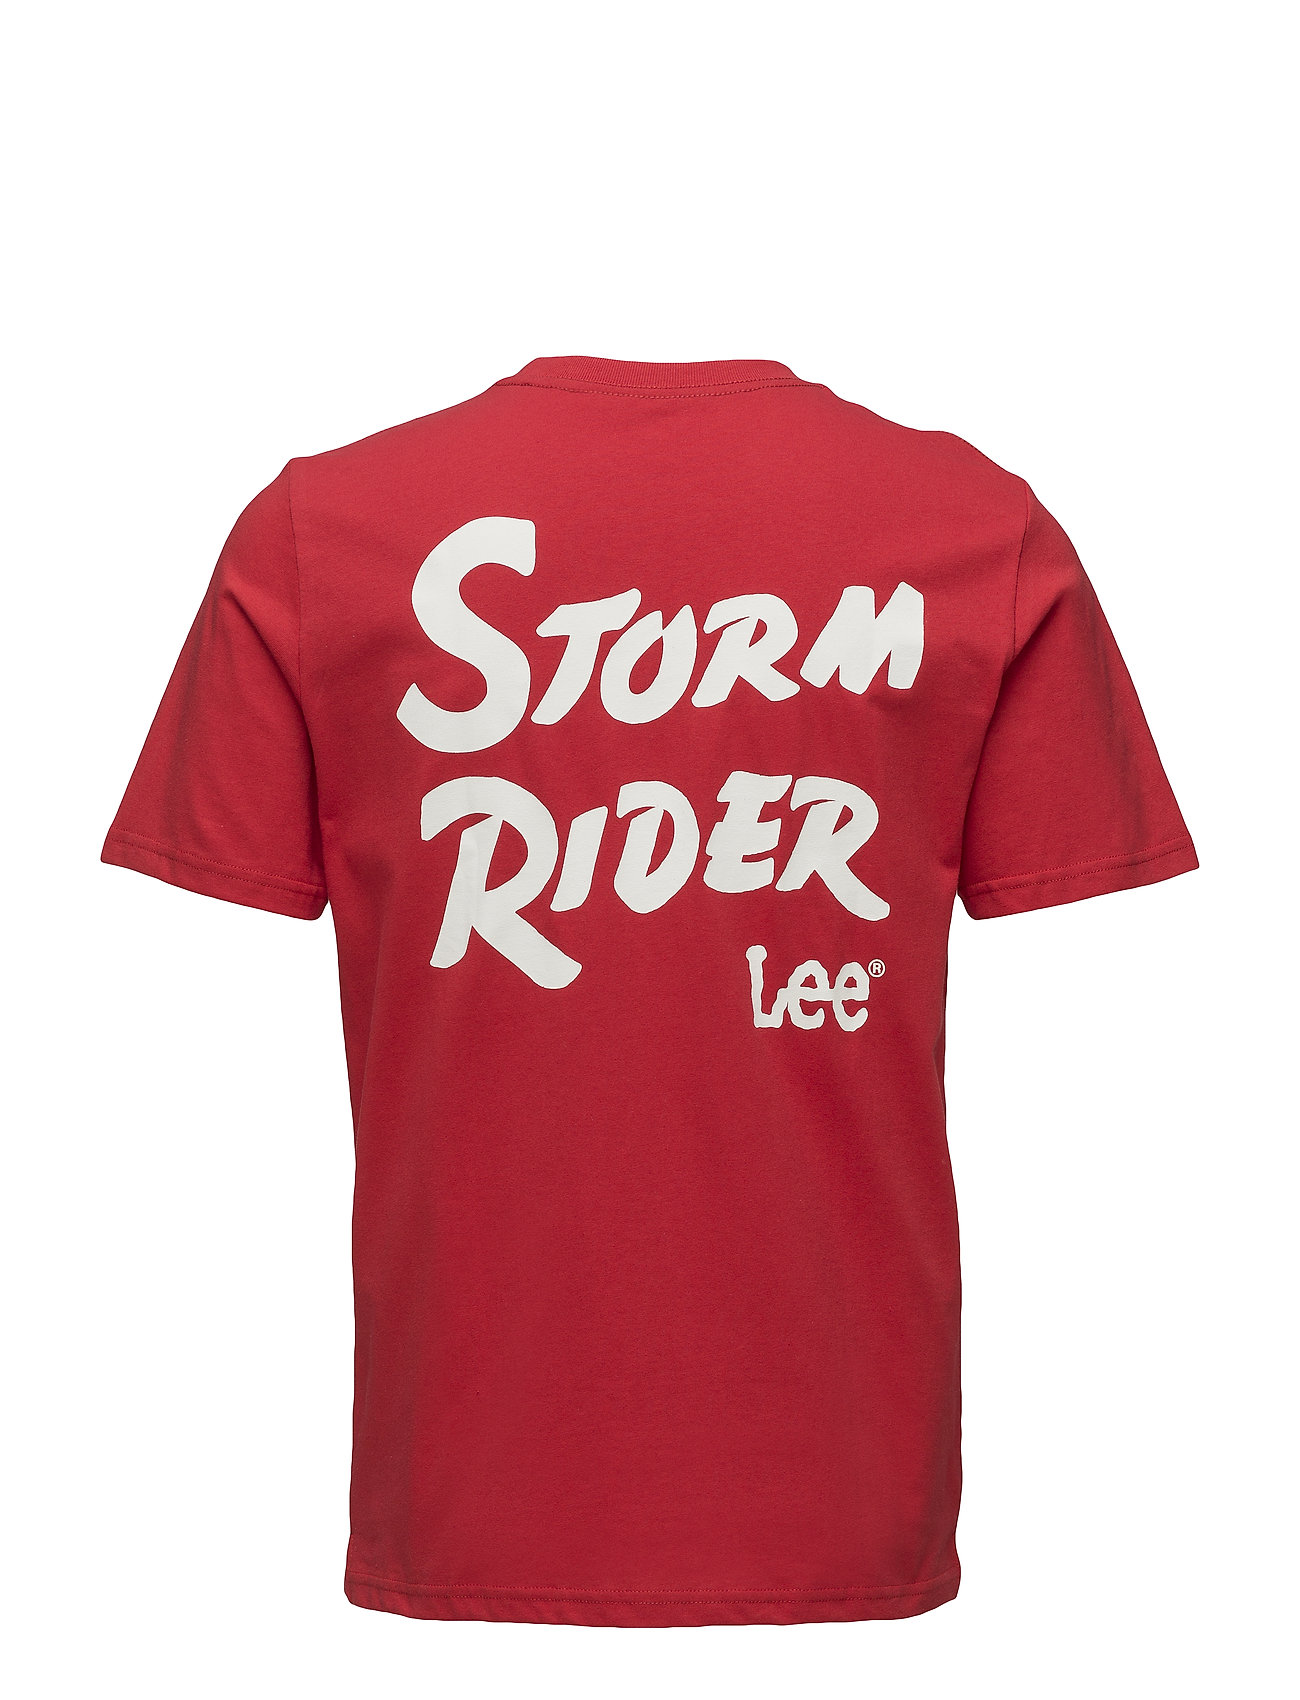 RedLee Jeans Storm Storm Tbright Rider RedLee Tbright Rider eQdBoxrCW